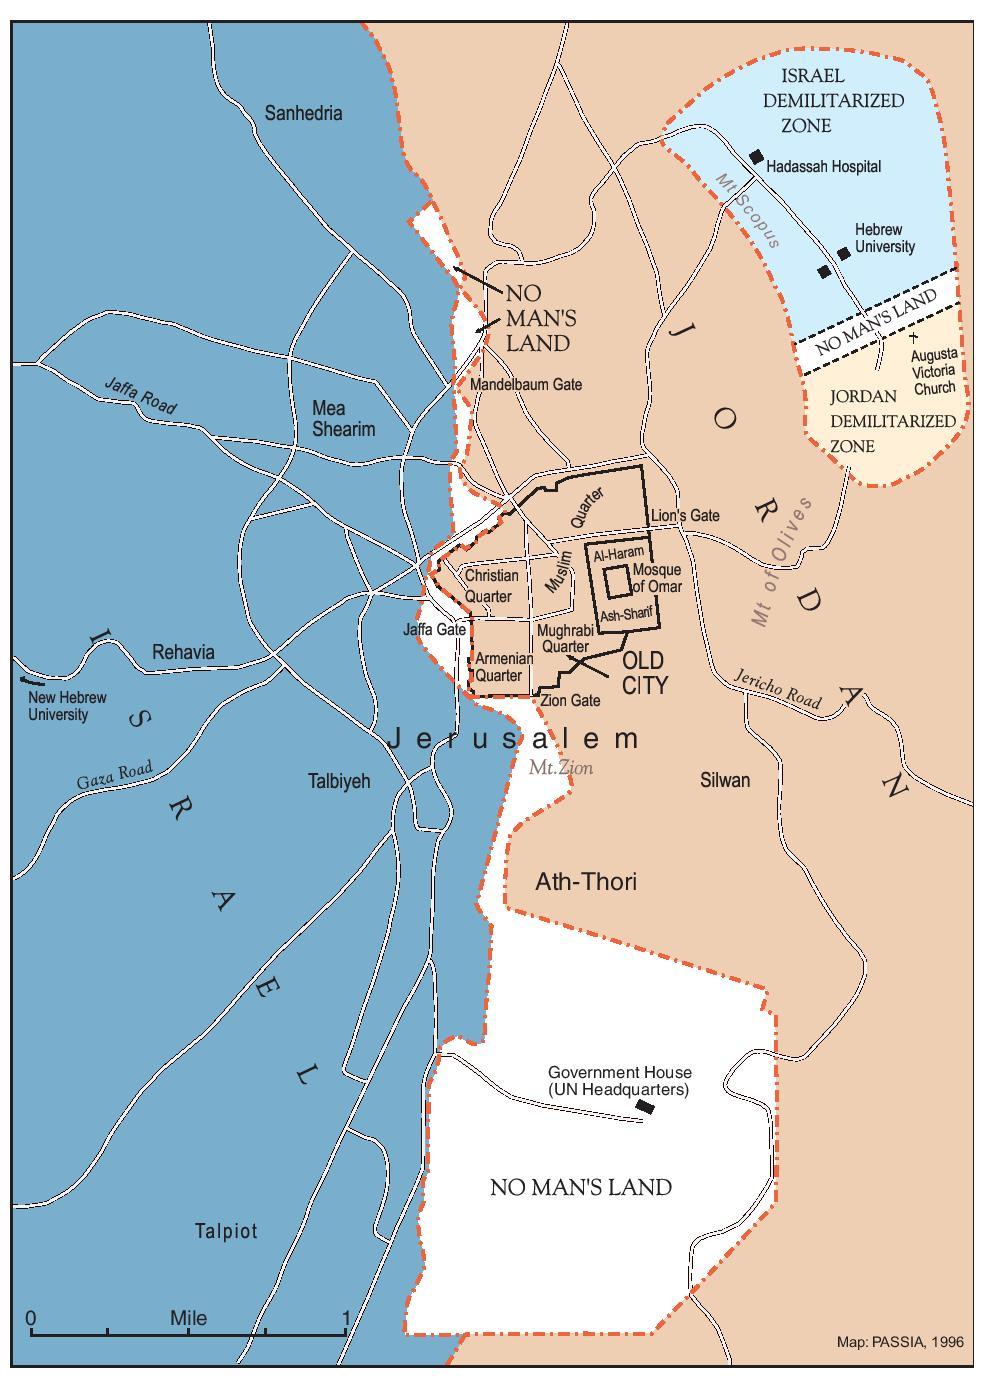 PASSIA MAPS Jerusalem PARTITIONED JERUSALEM - Jordan map hd pdf